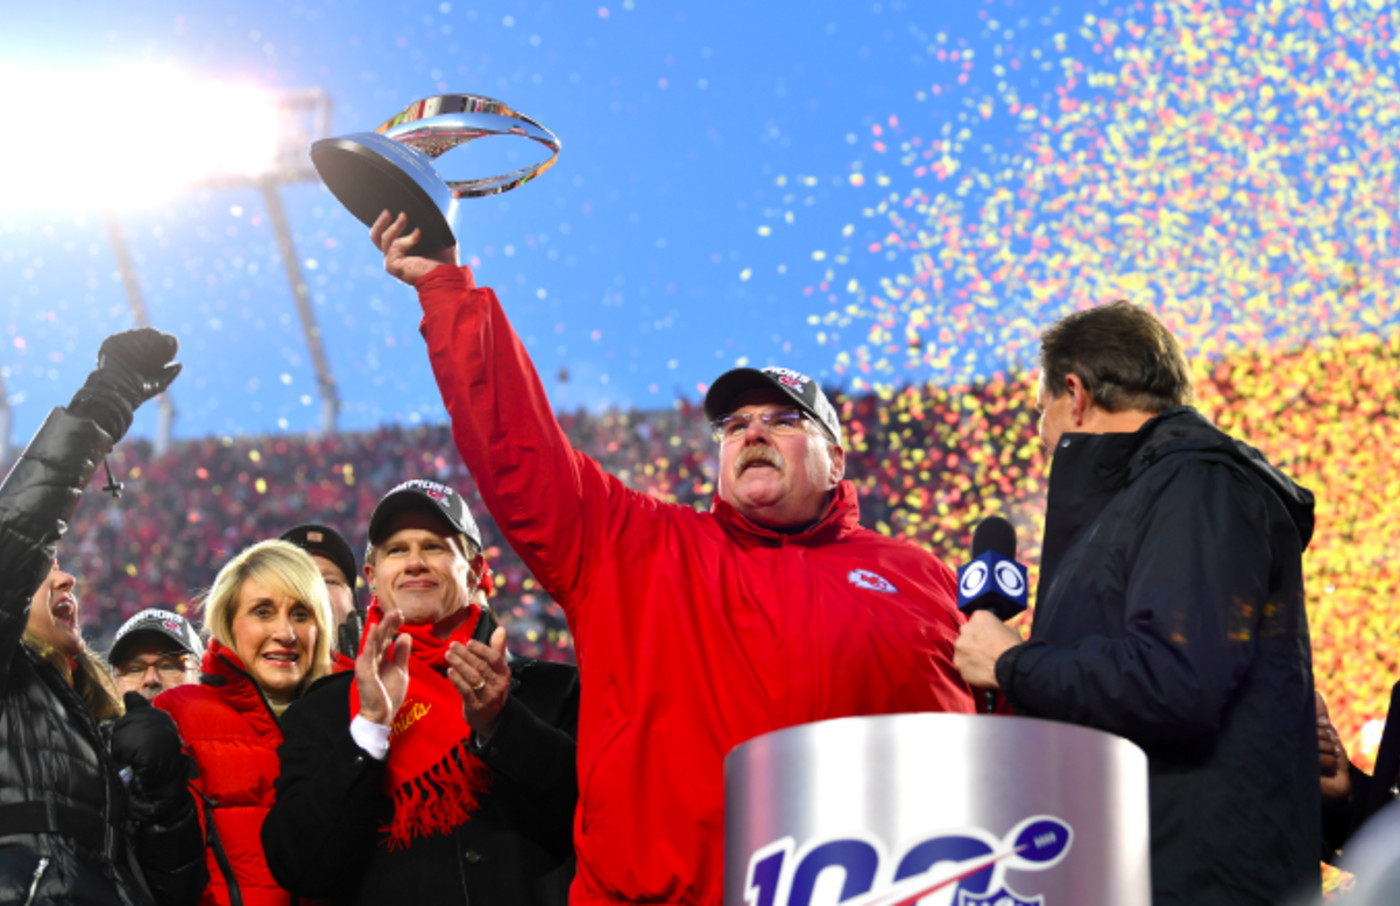 Head coach Andy Reid of the Kansas City Chiefs